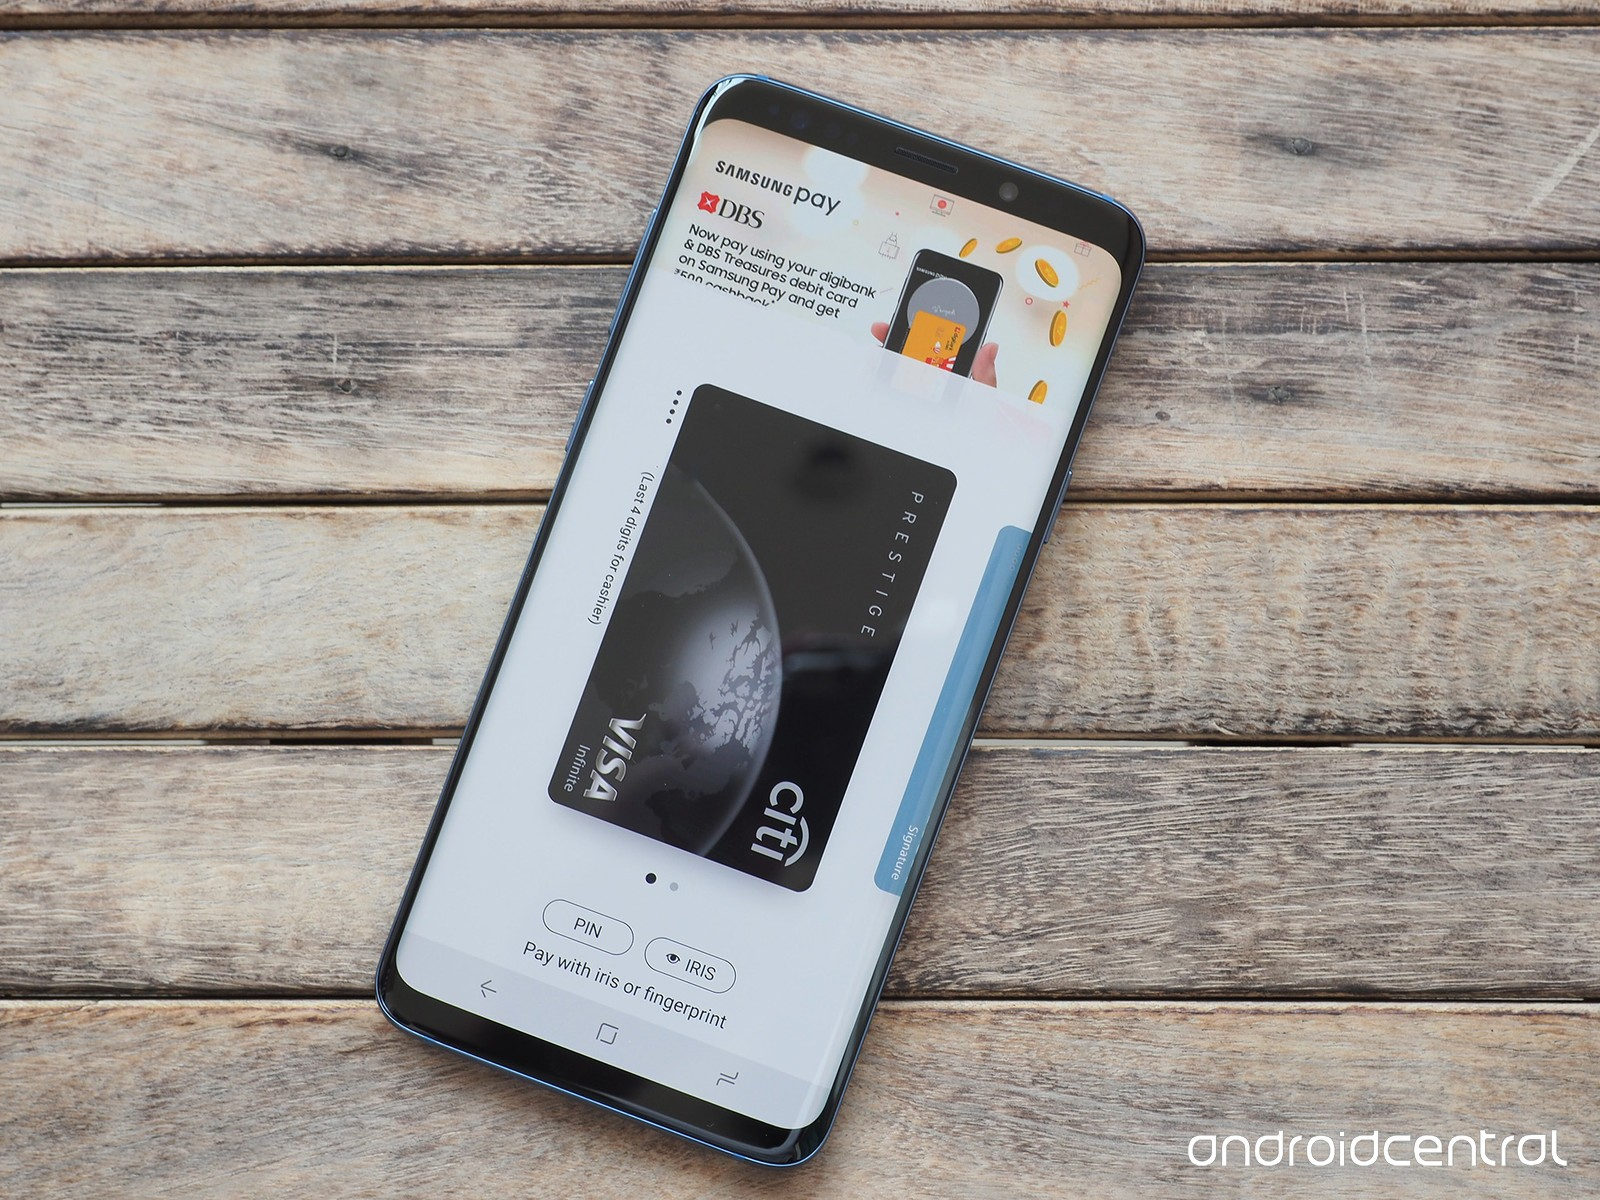 Samsung Galaxy S9+ Samsung Pay